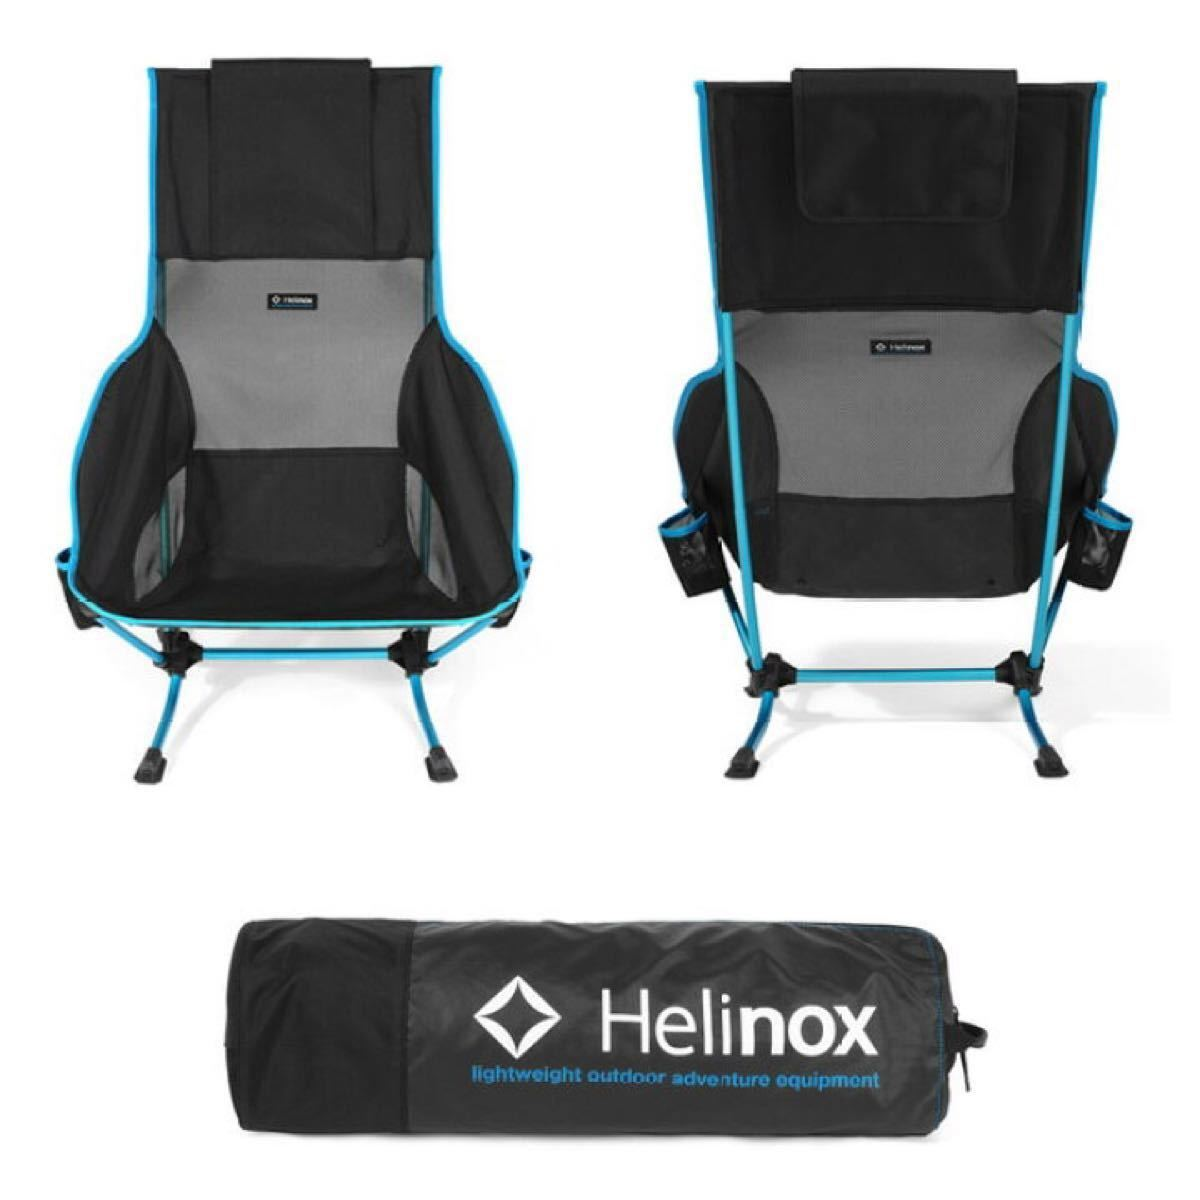 Helinox ヘリノックス プライアチェア ブラック BK  アウトドアチェア ビーチチェア キャンプチェア ハイバック